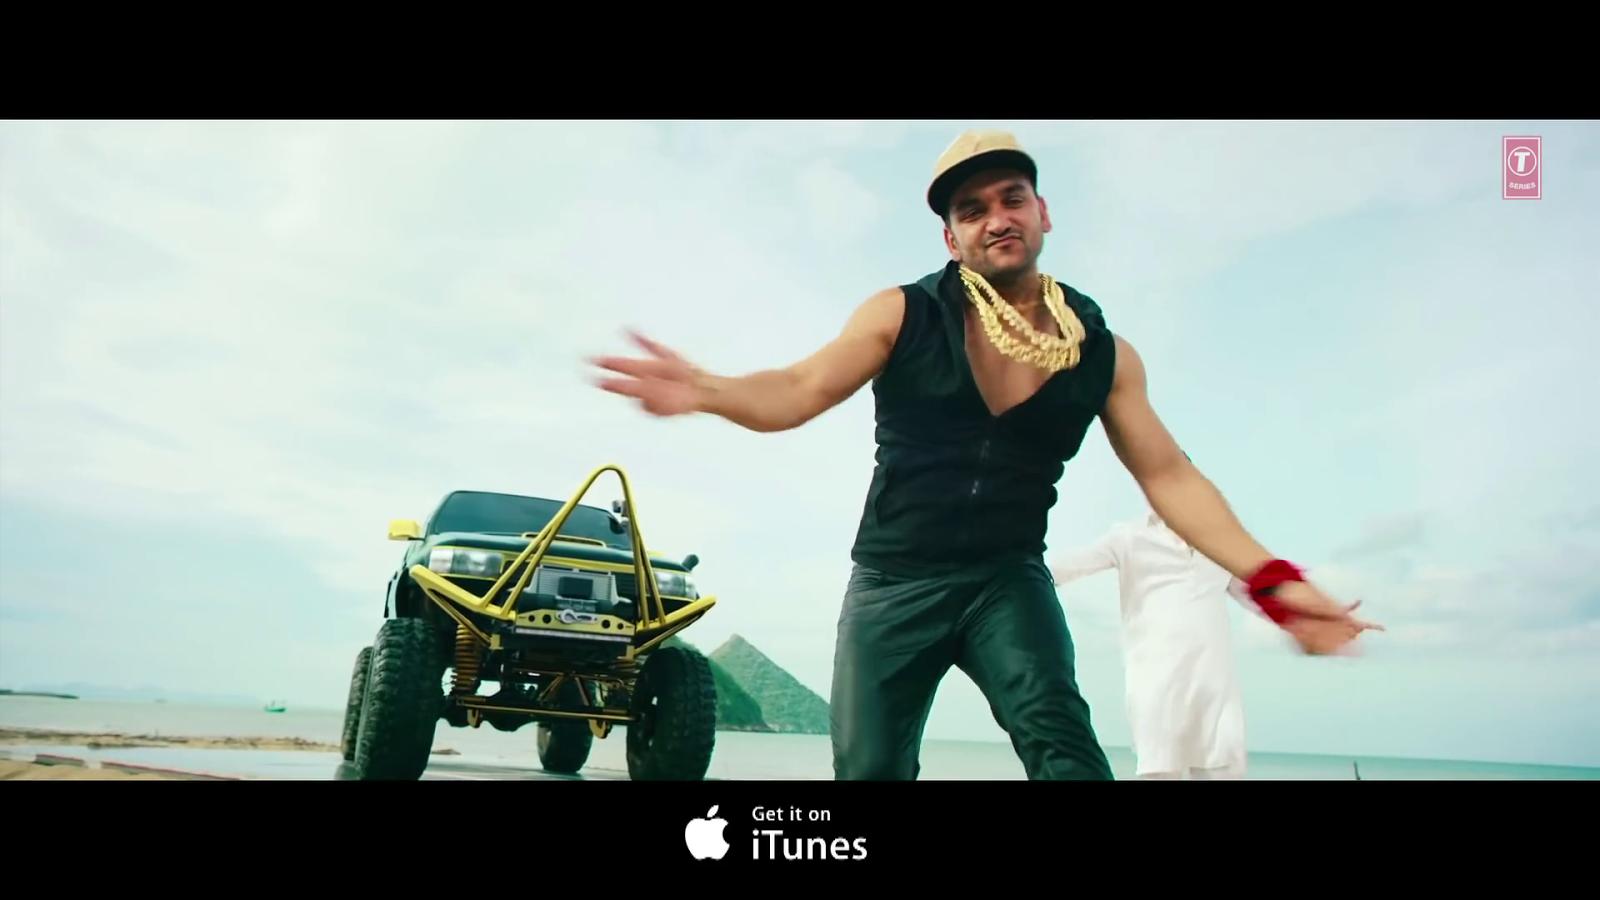 Mp4videosongs : Mp4 Songs, Free Download Mp4 Videos Songs, Hindi Song Lyrics